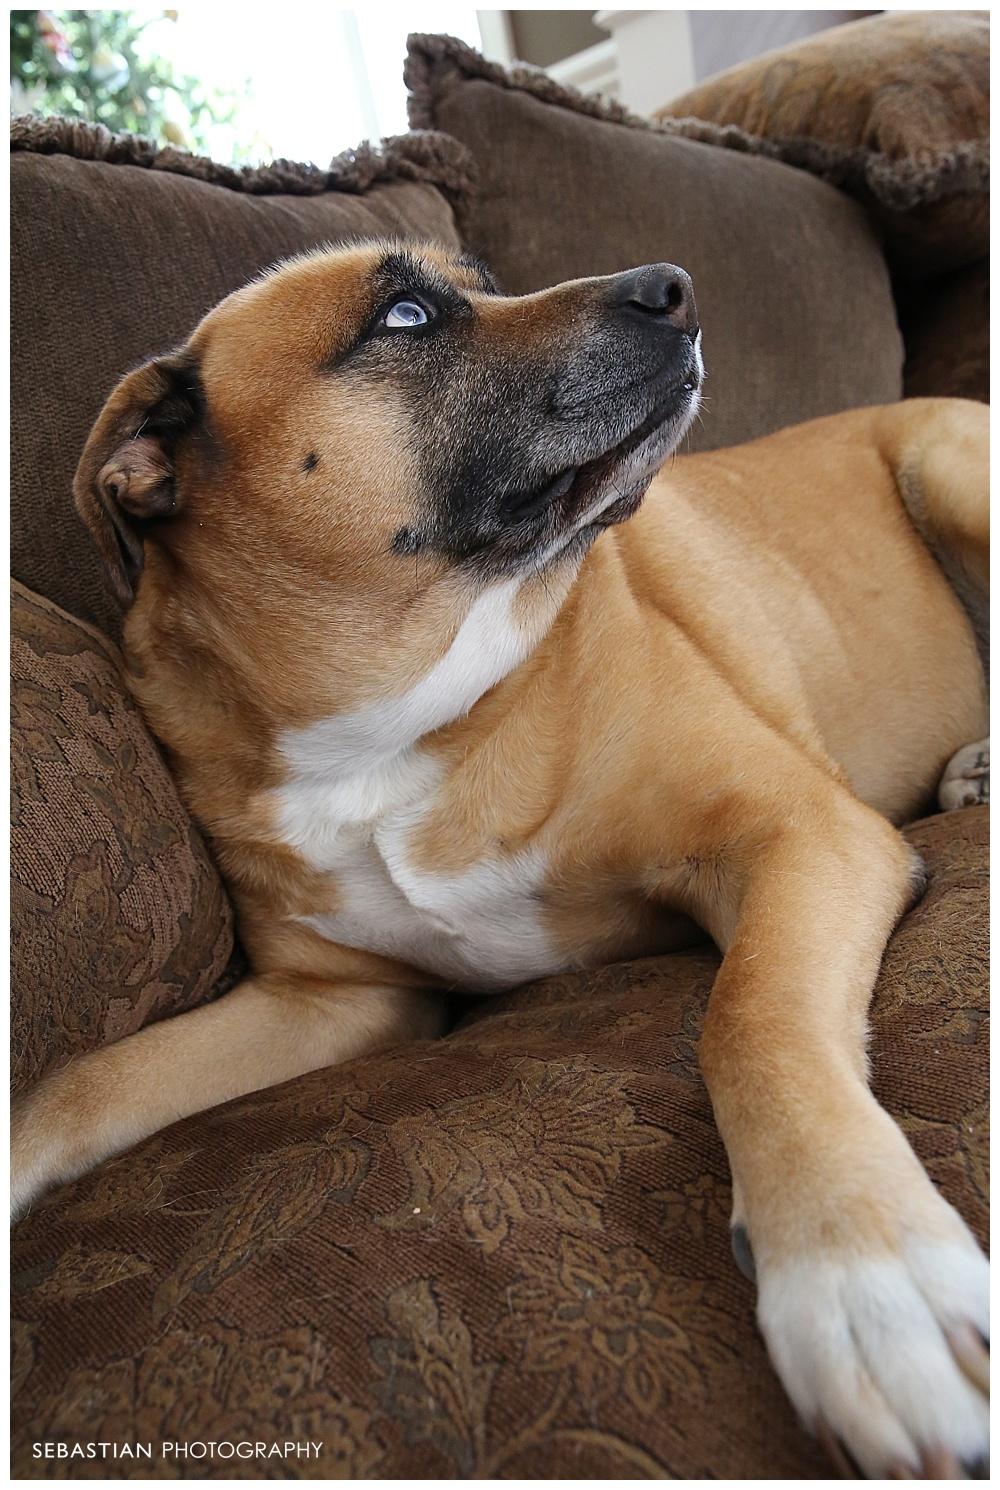 Sebastian_Photography_Pet_Pictures_Dog_Puppy_BlueEyes_Boxer.jpg